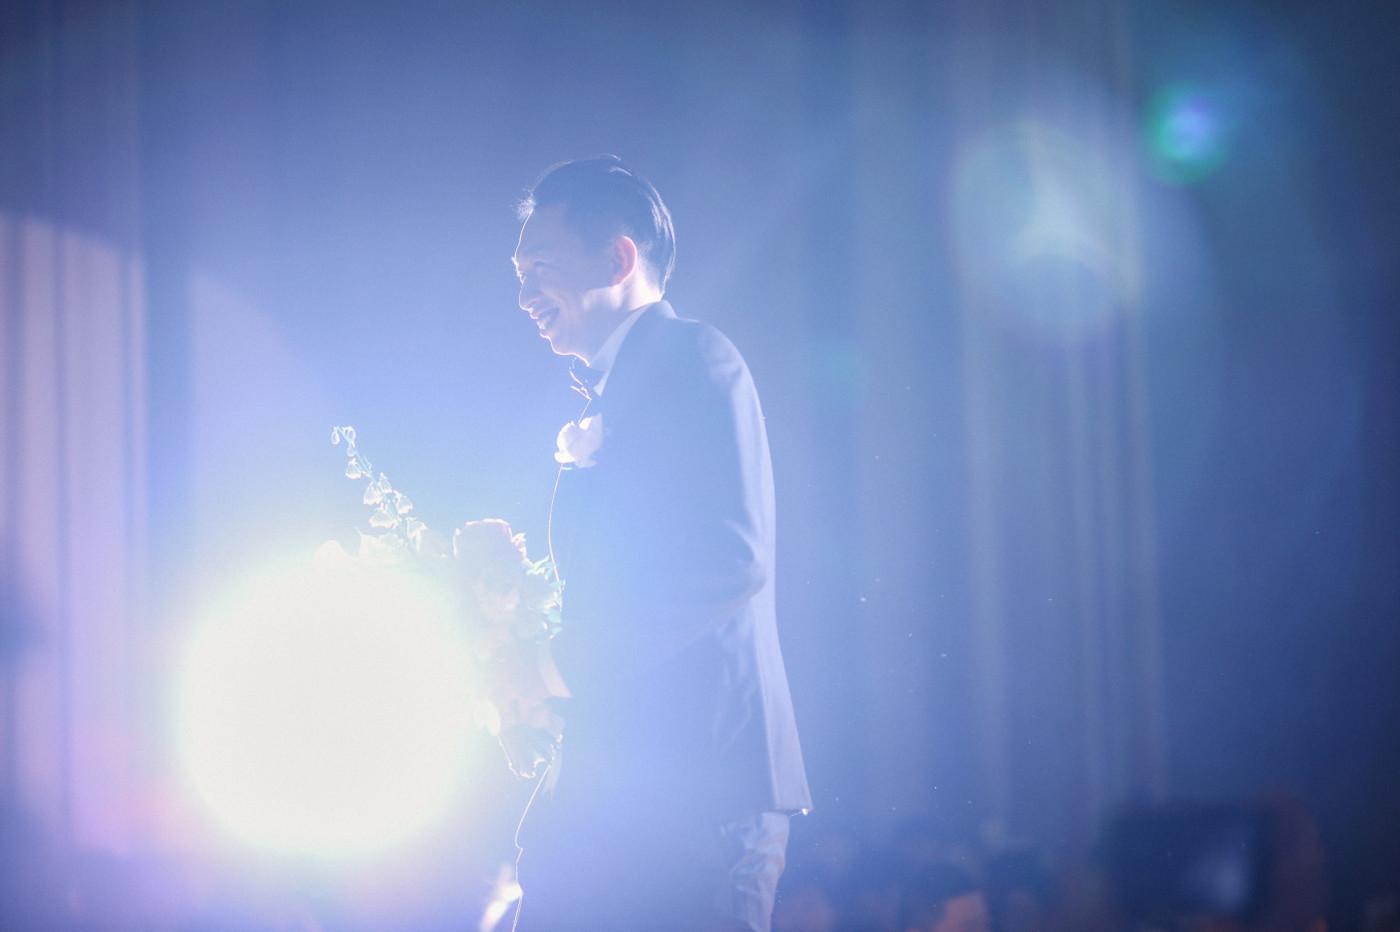 【KAI 婚礼纪实】Z&Y 常州婚礼27